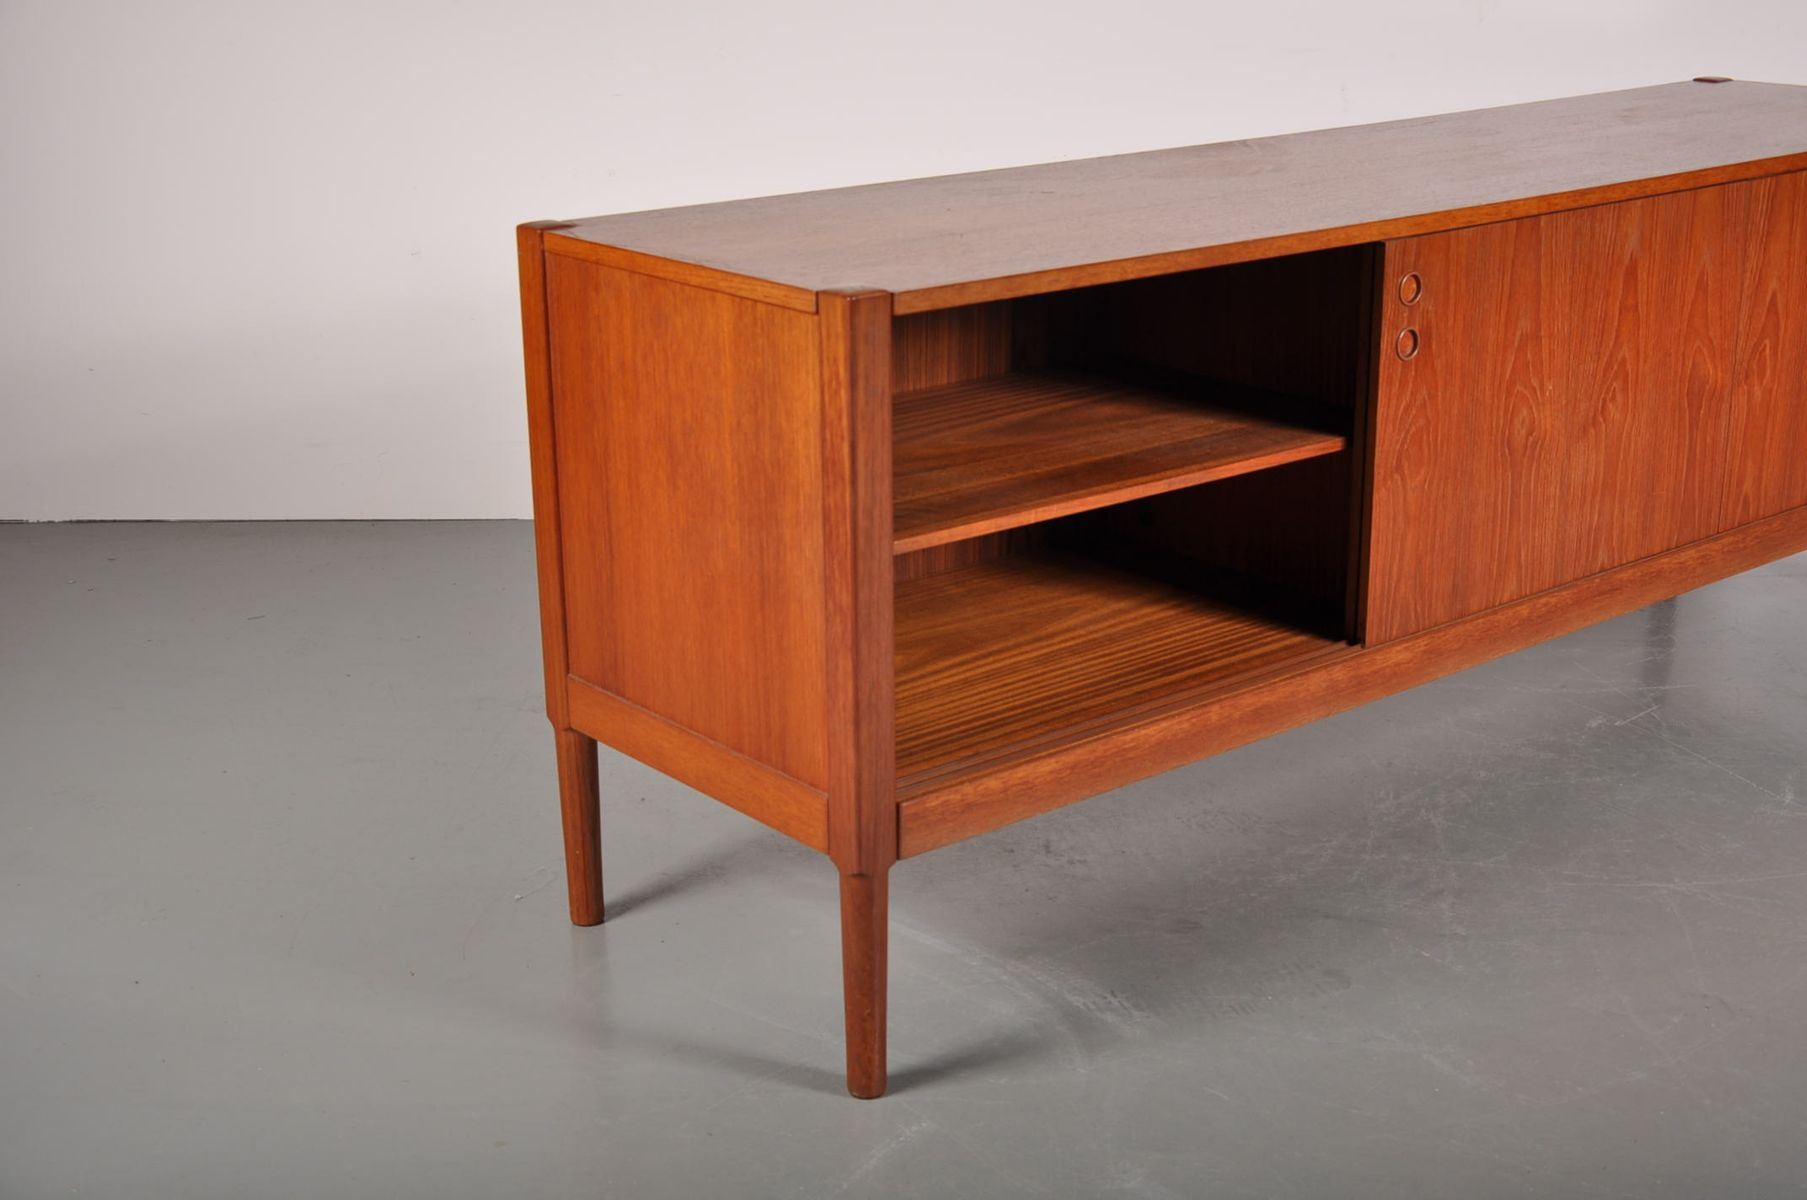 Danish teak sliding door sideboard 1960s for sale at pamono for Sideboard 200 cm